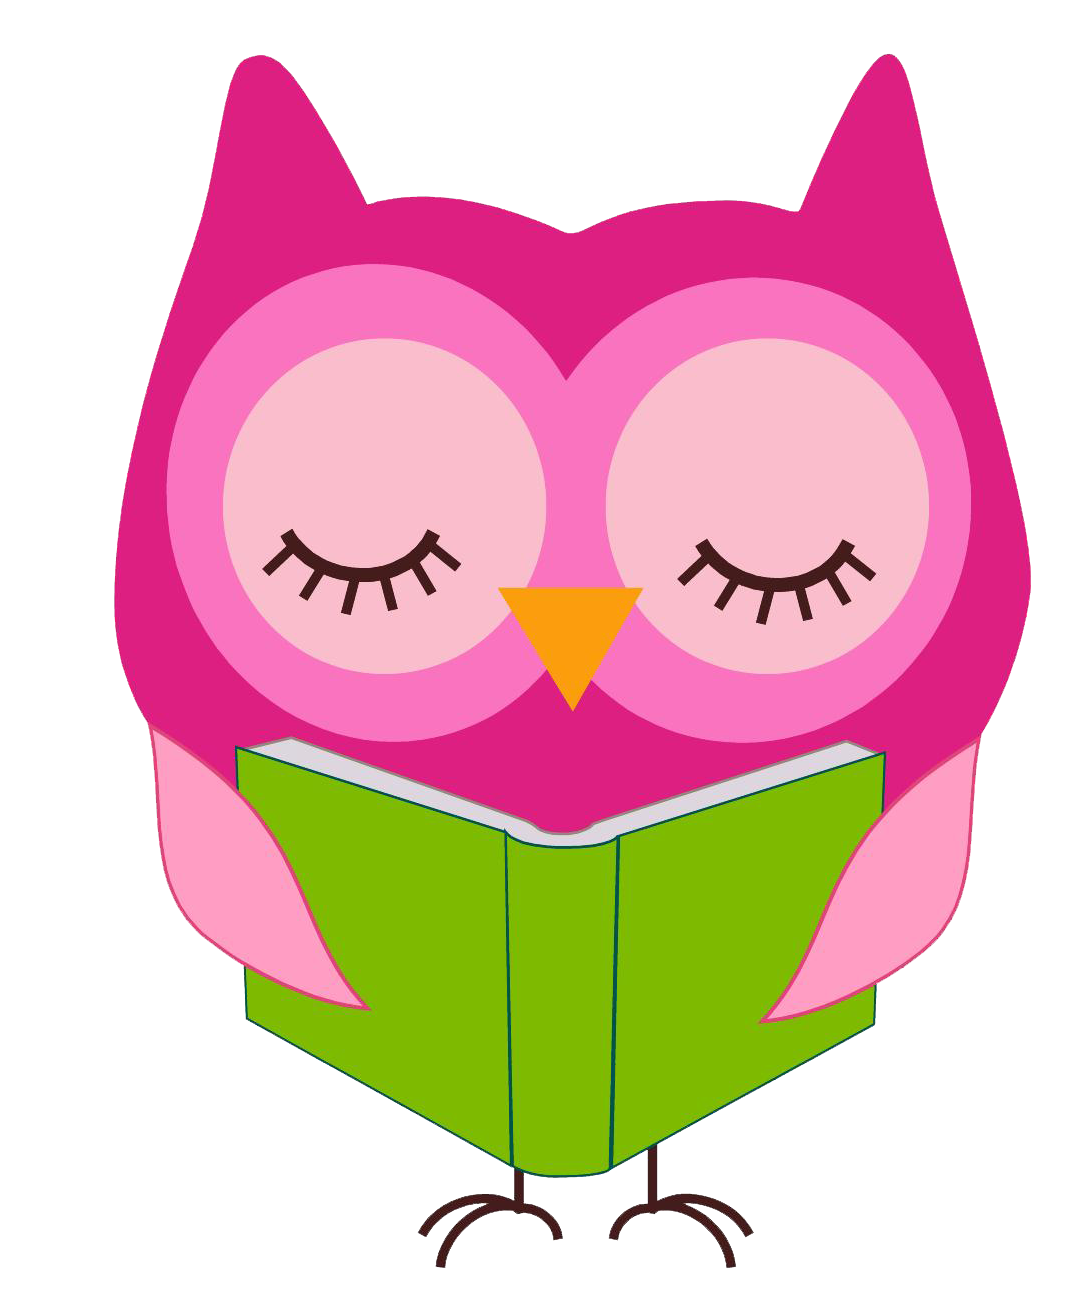 Purple flowers clip art border cliparts co - Owl Reading Clip Art Cliparts Co